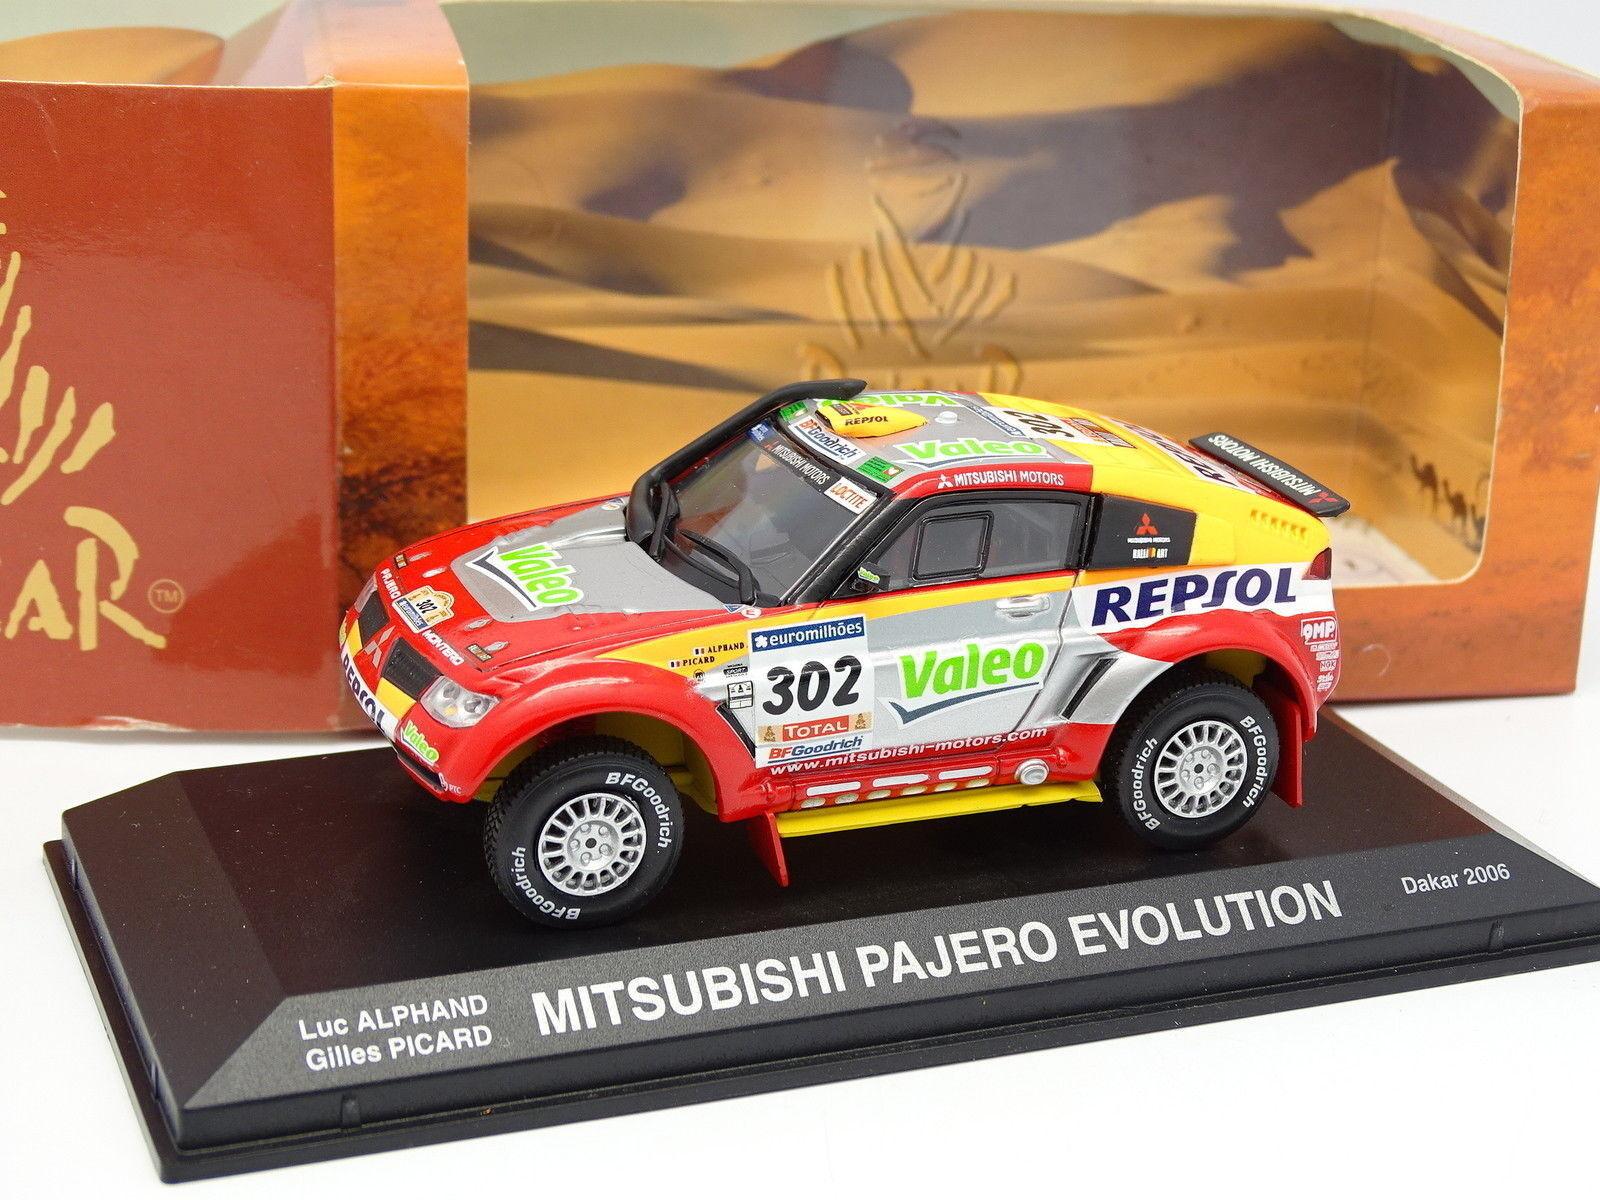 Norev 1 43 - Mtsubishi Pajero Evolution Paris Dakar 2006